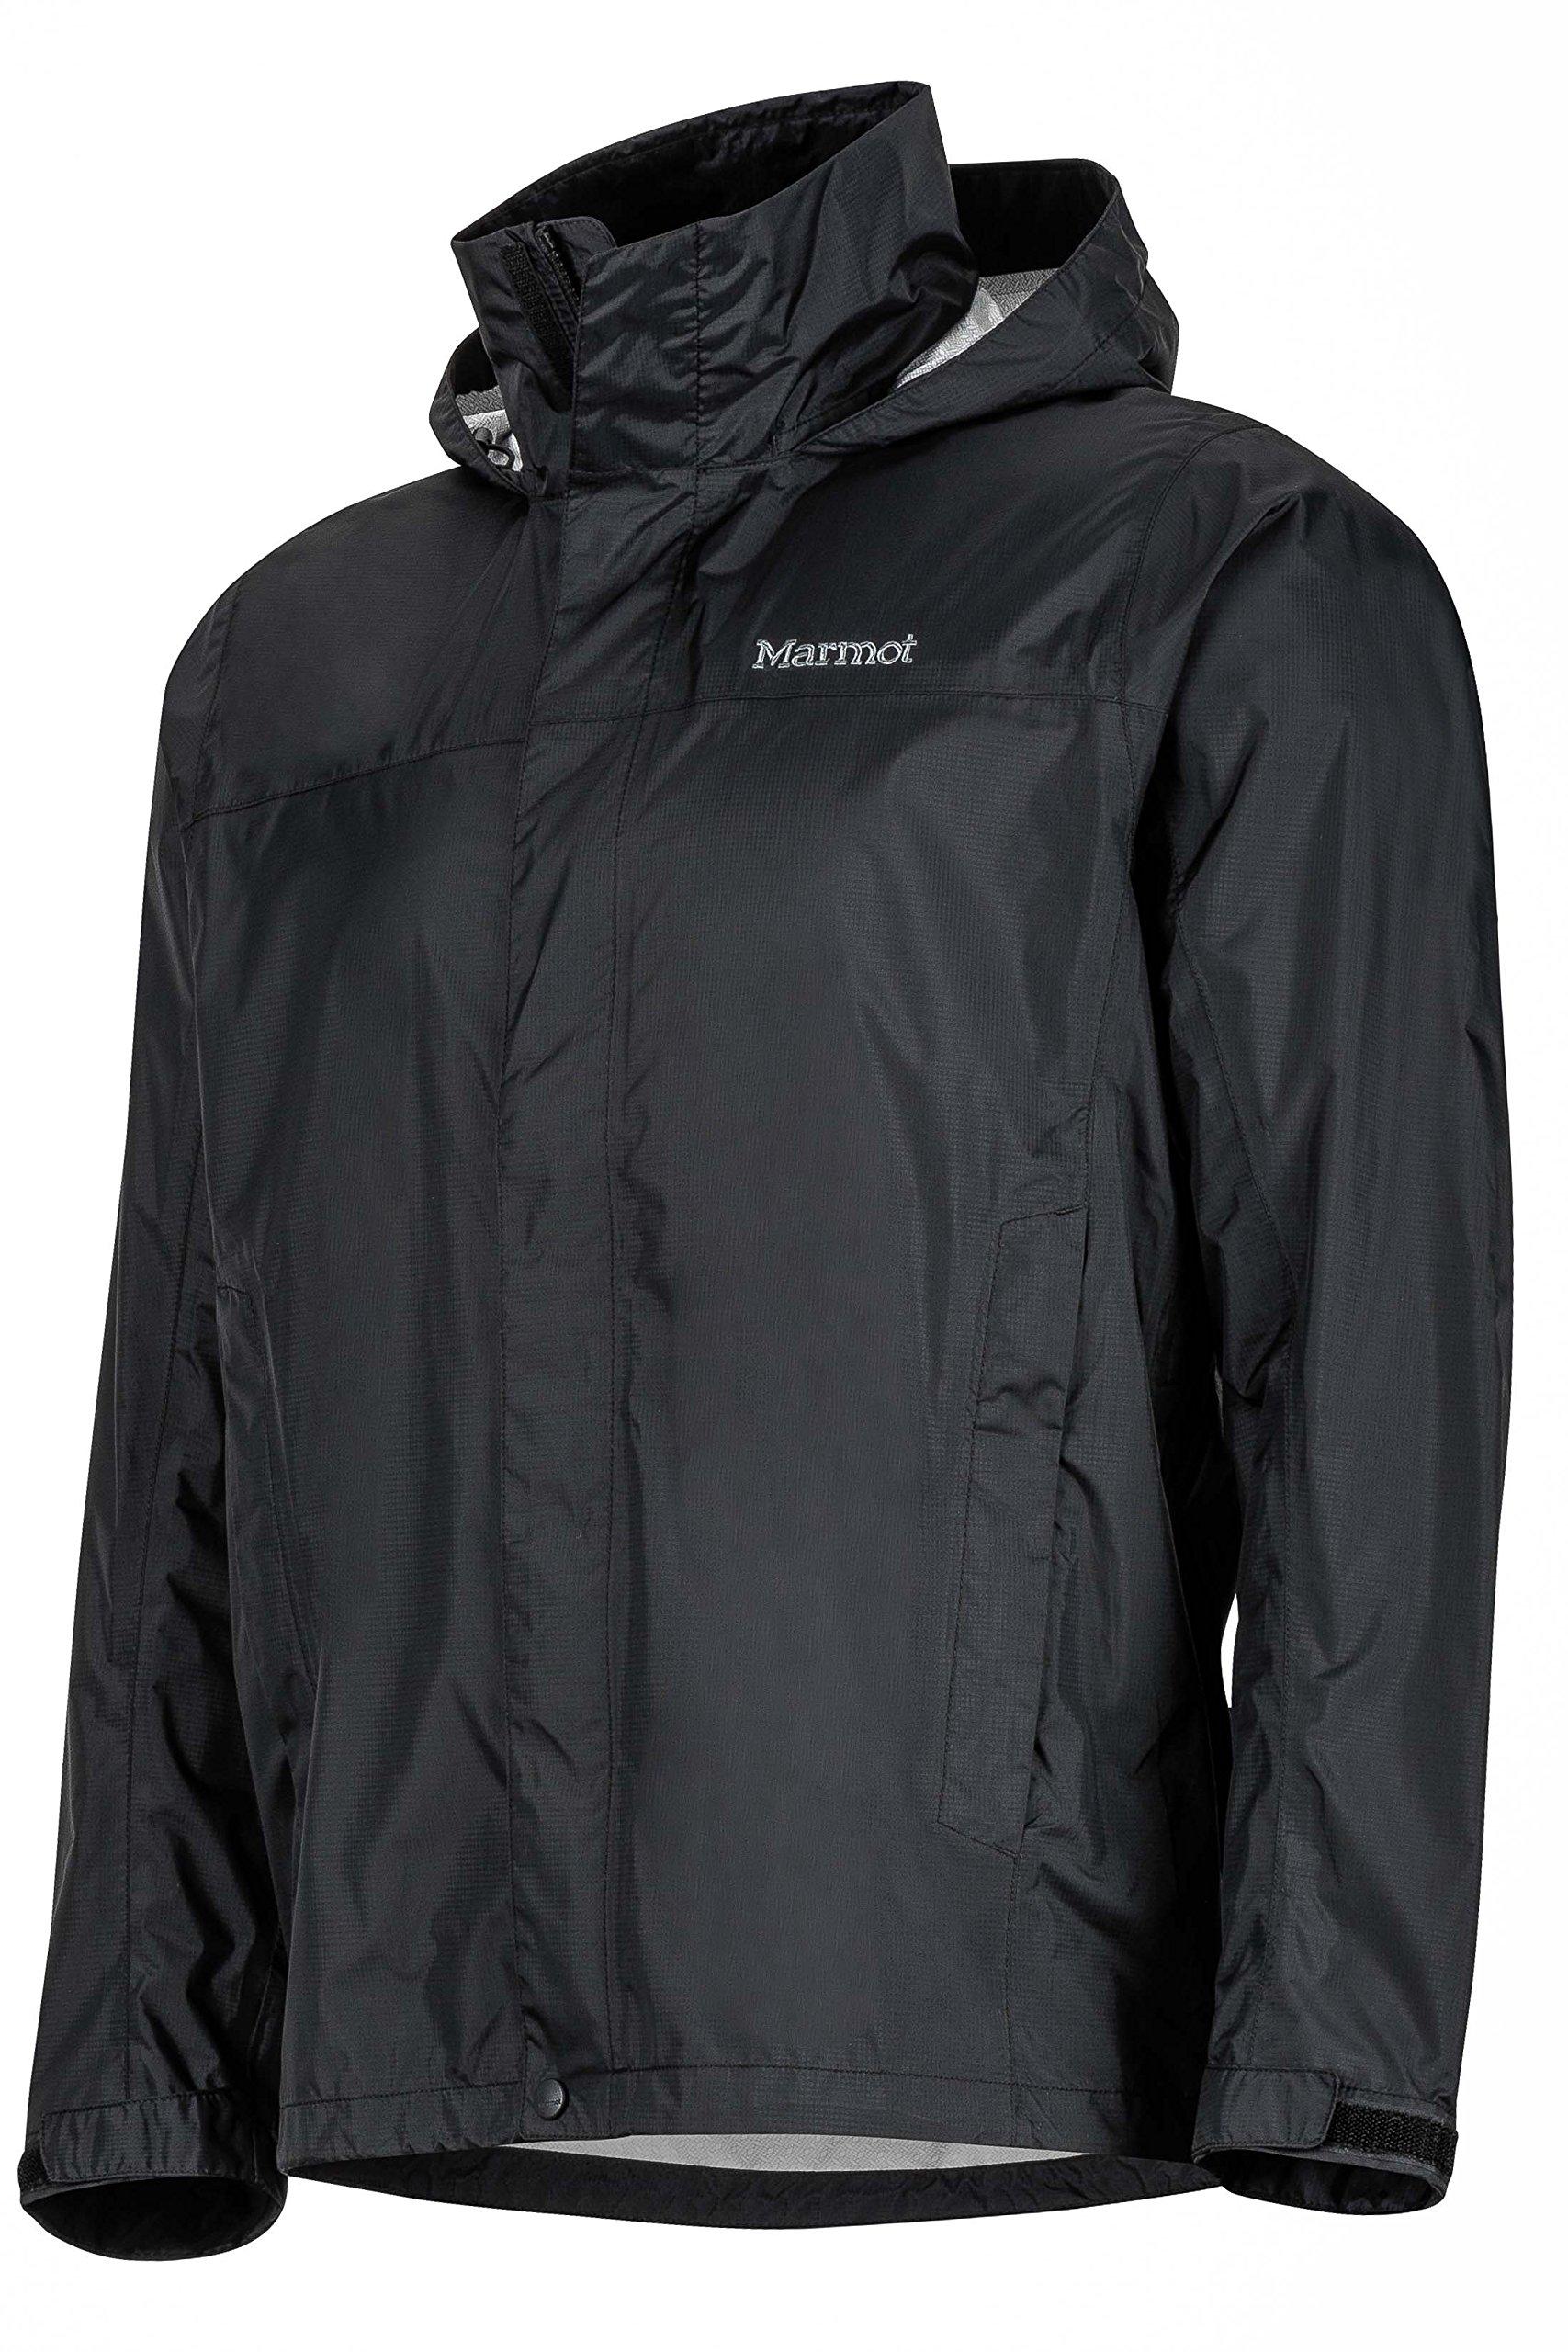 91 H7zJHhAL - Marmot PreCip Lightweight Raincoat, Men, Waterproof, Windproof & Breathable